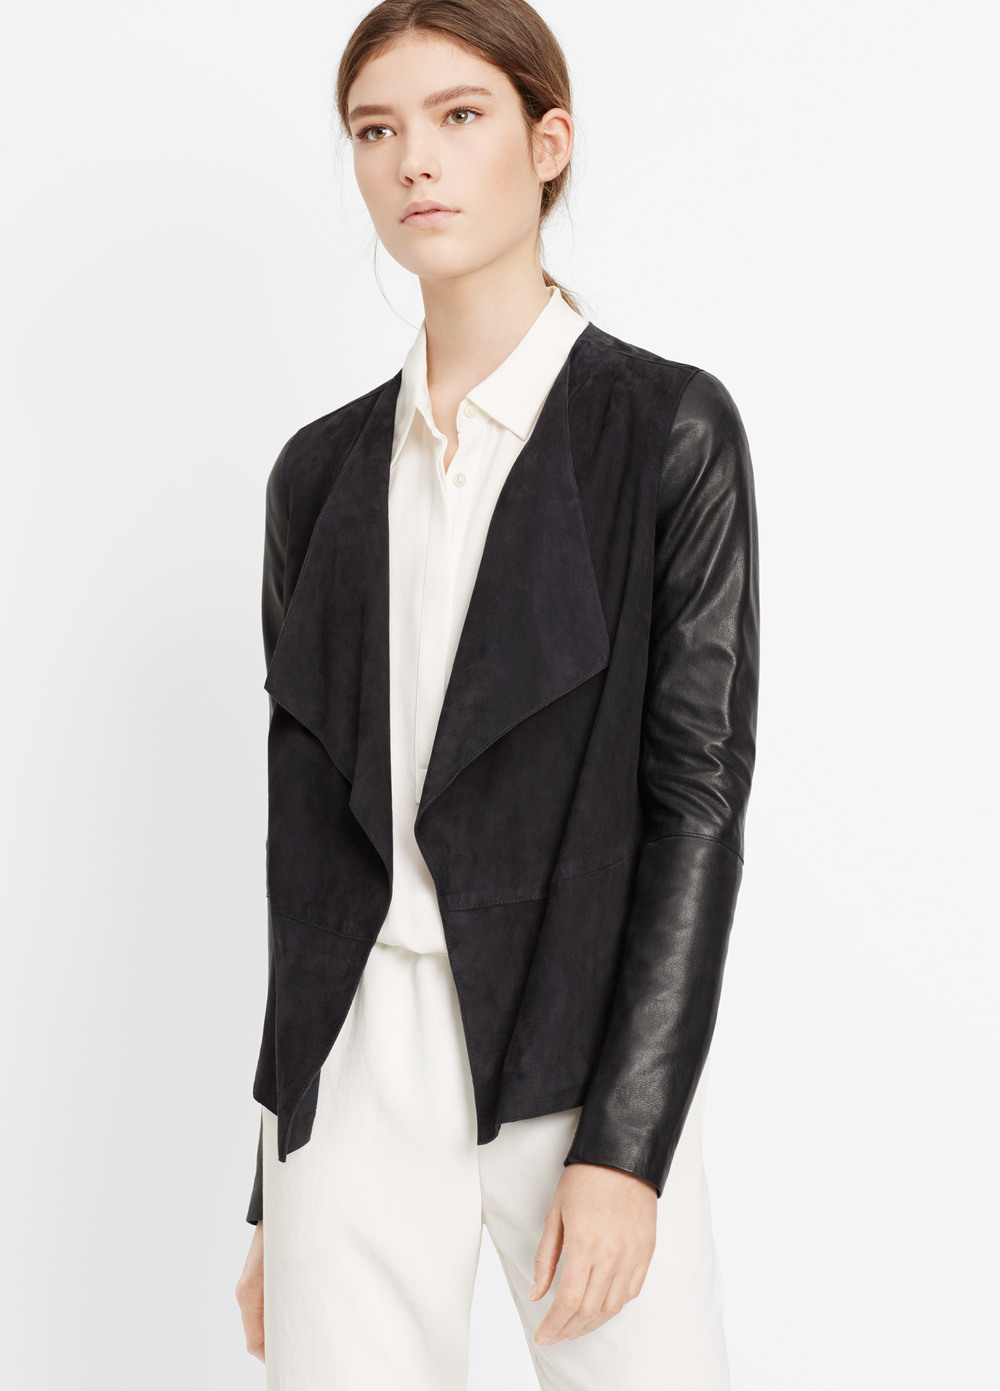 Vince Suede Blocked Drape Front Jacket. Available in black/brown, black/black. Vince. $995.